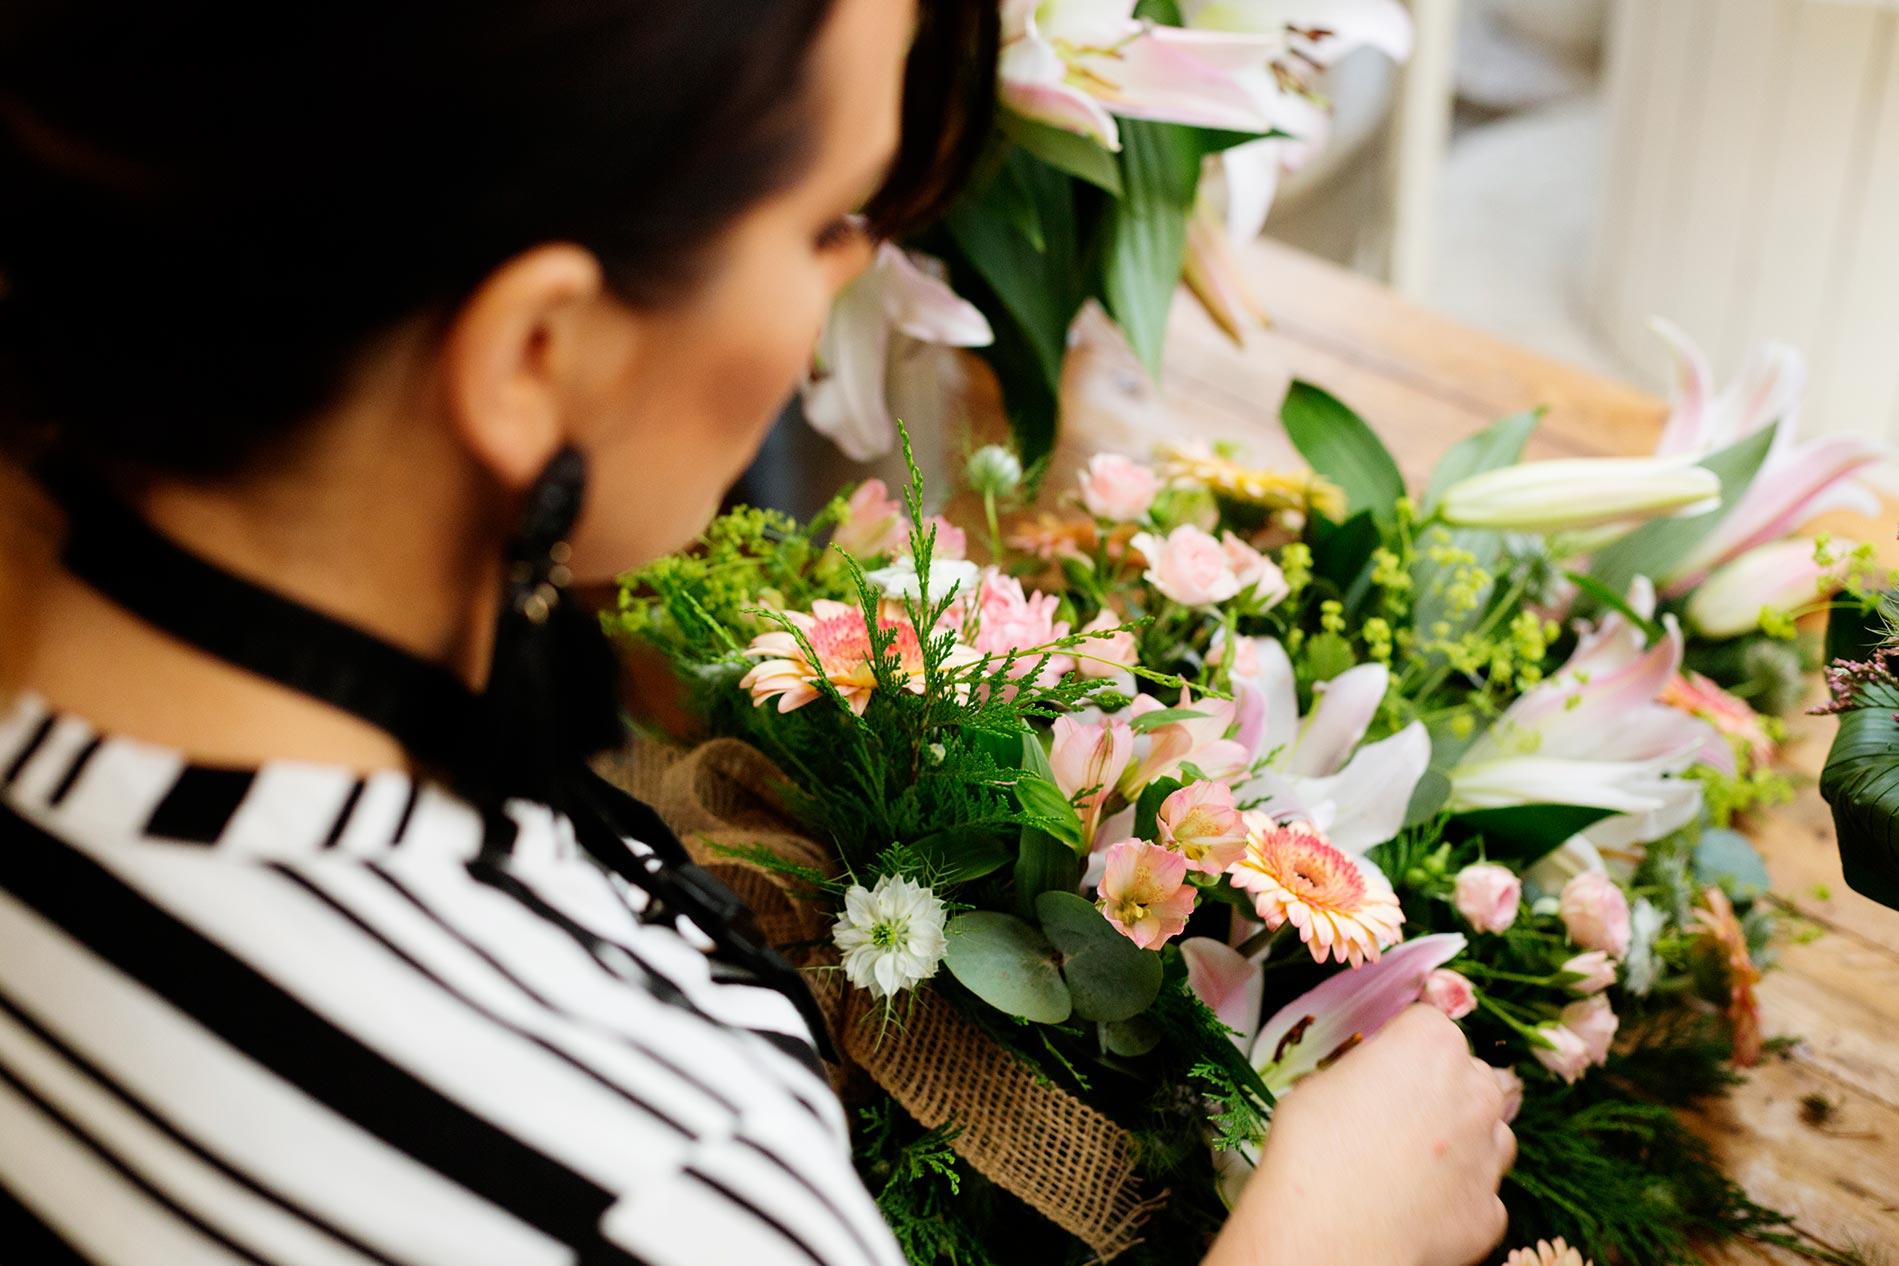 florist-aucklandcbd-making-flower-bouquet